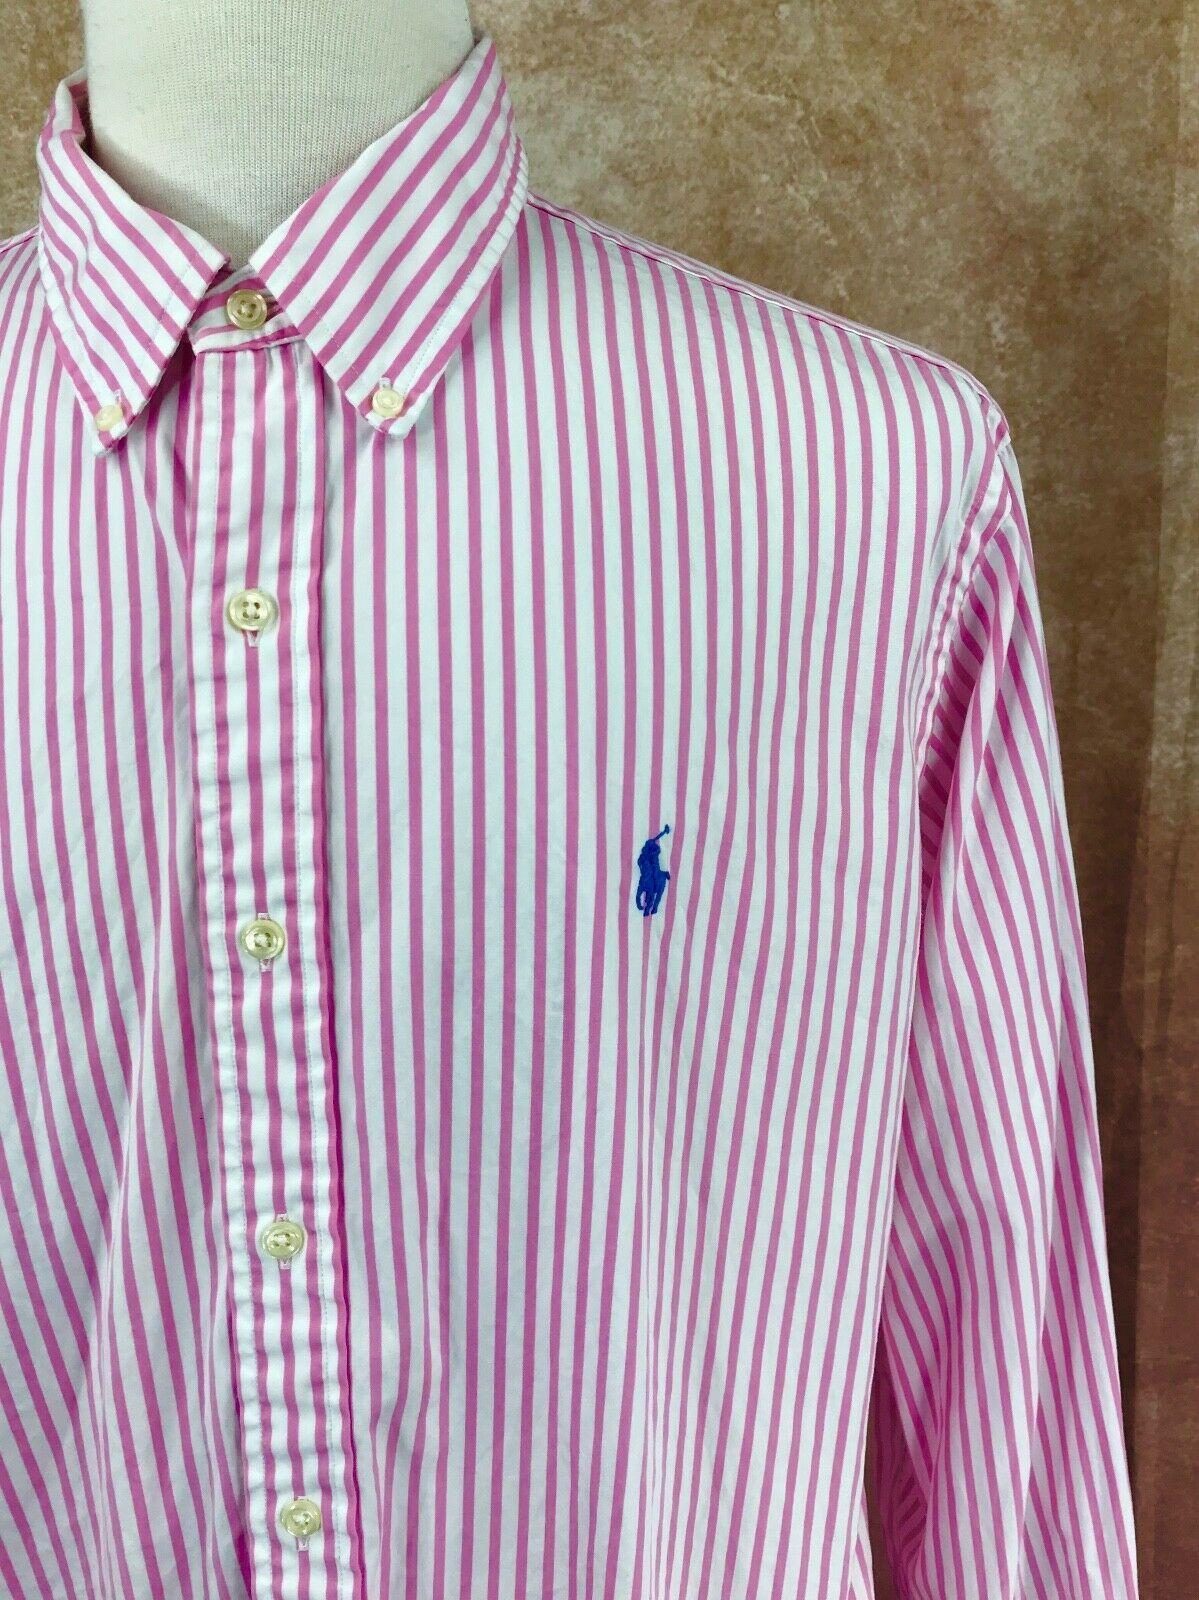 Ralph Lauren Polo Button Down Long Sleeve 100% Cotton Pink Stripe Shirt Men's XL